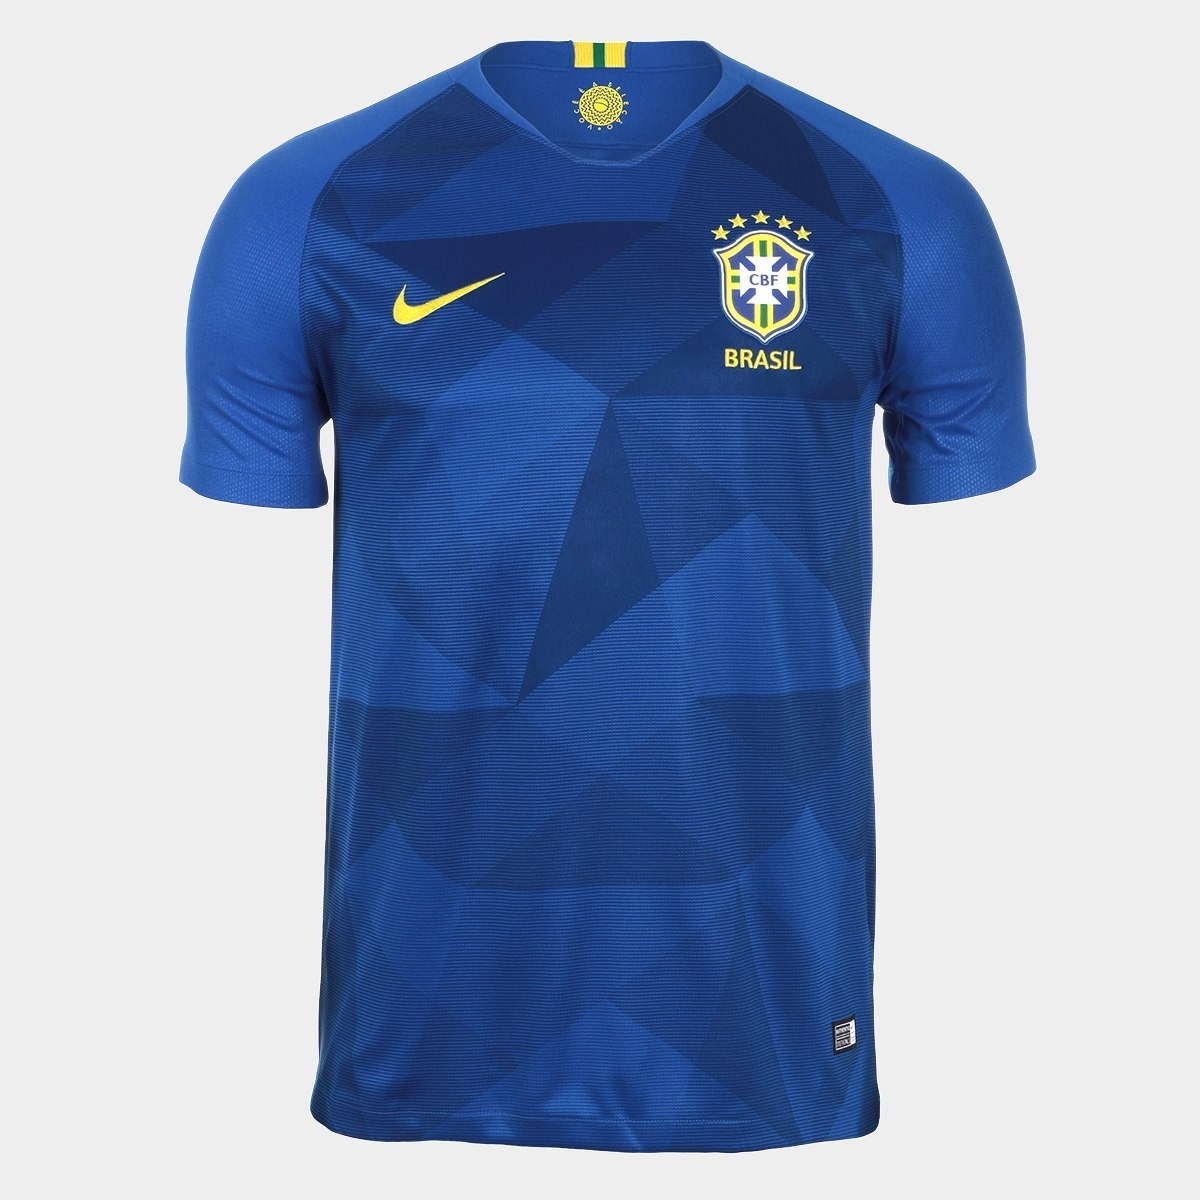 526c6894da028 camisa seleção brasil ii 2018 s n° - torcedor nike masculina. Carregando  zoom.